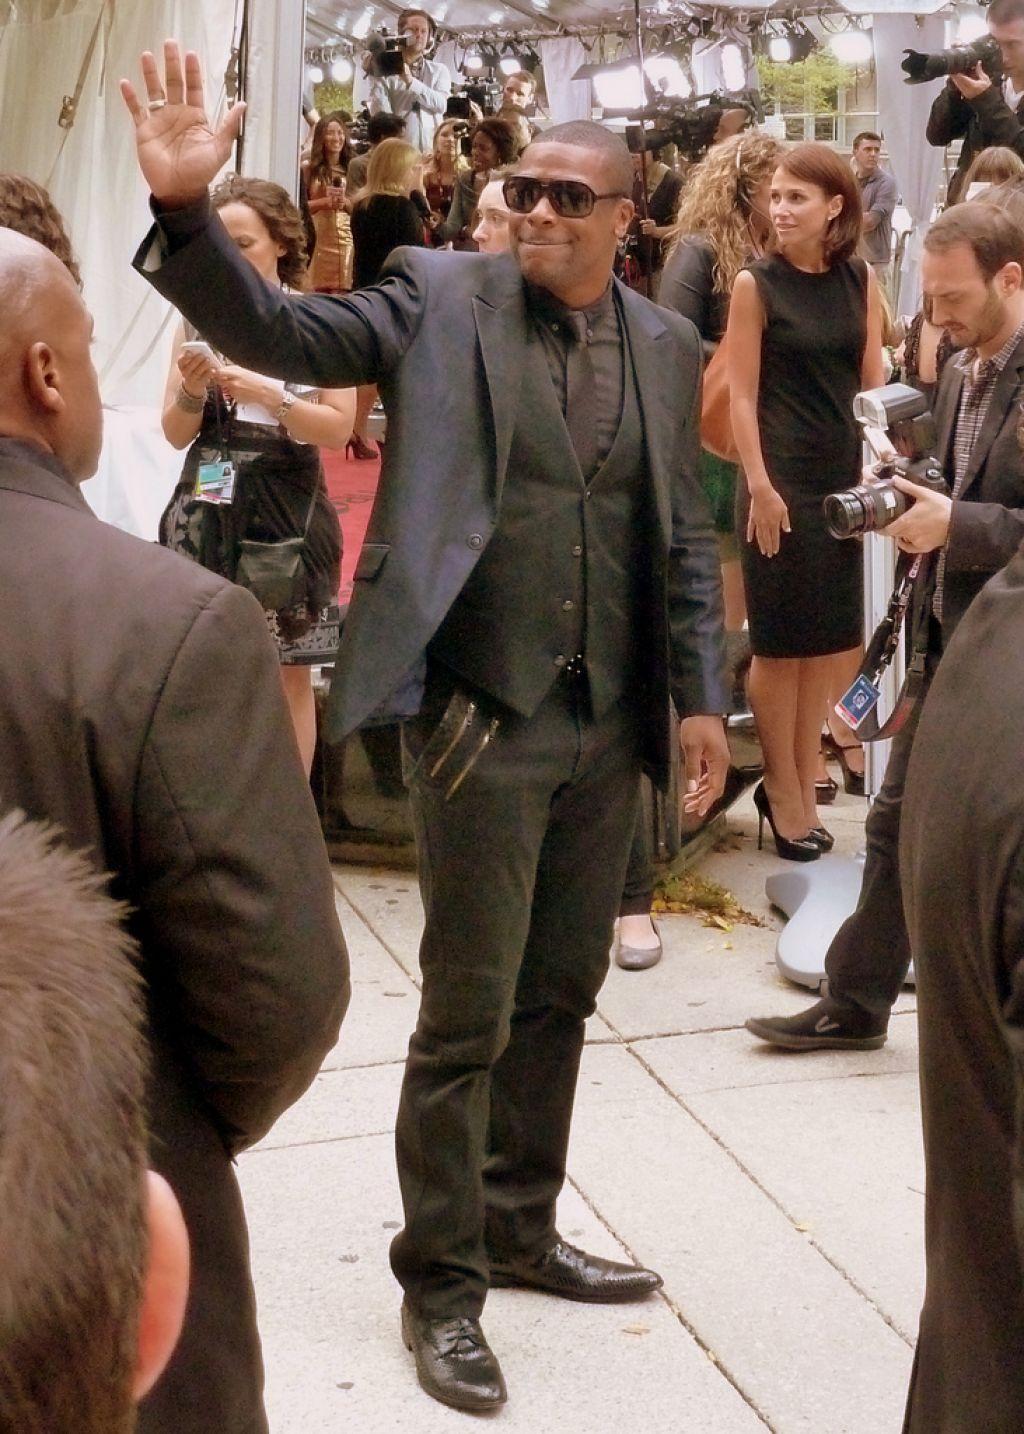 silver linings playbook15 Jennifer Lawrence, Robert De Niro, Bradley Cooper and Chris Tucker  Appeared at The Premiere of Silver Linings Playbook